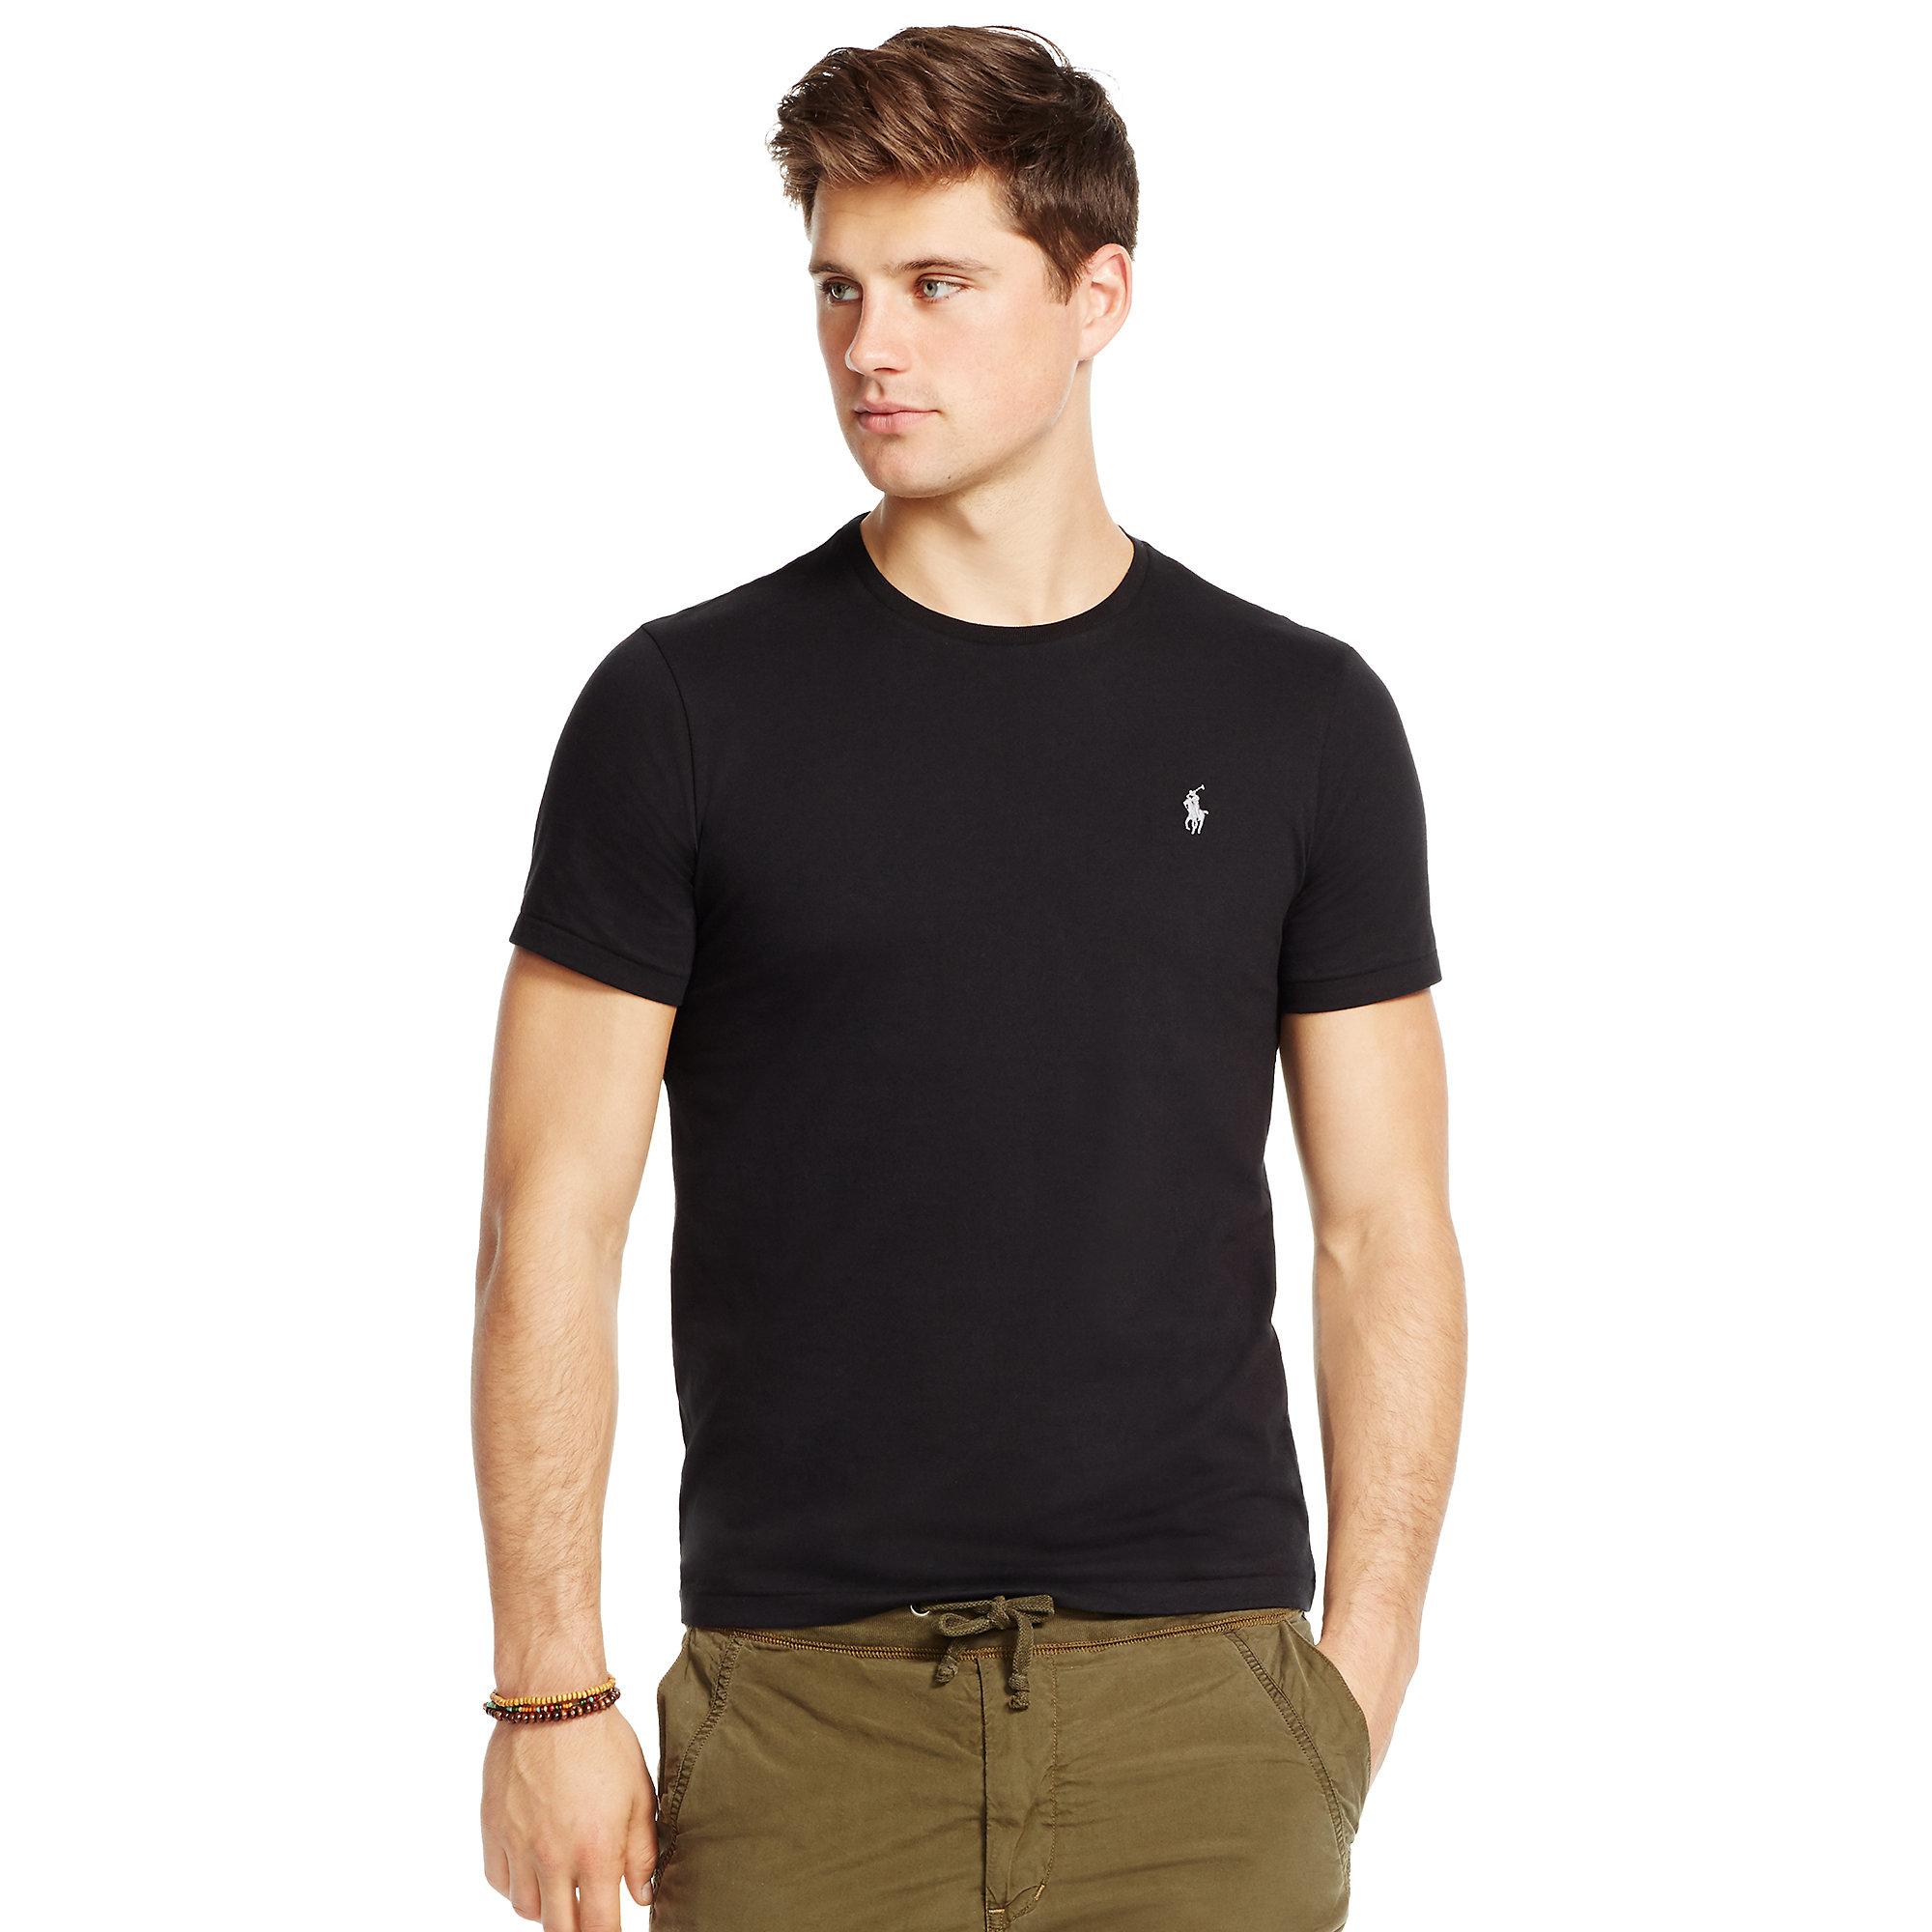 Lyst Polo Ralph Lauren Custom Fit Cotton T Shirt In Black For Men